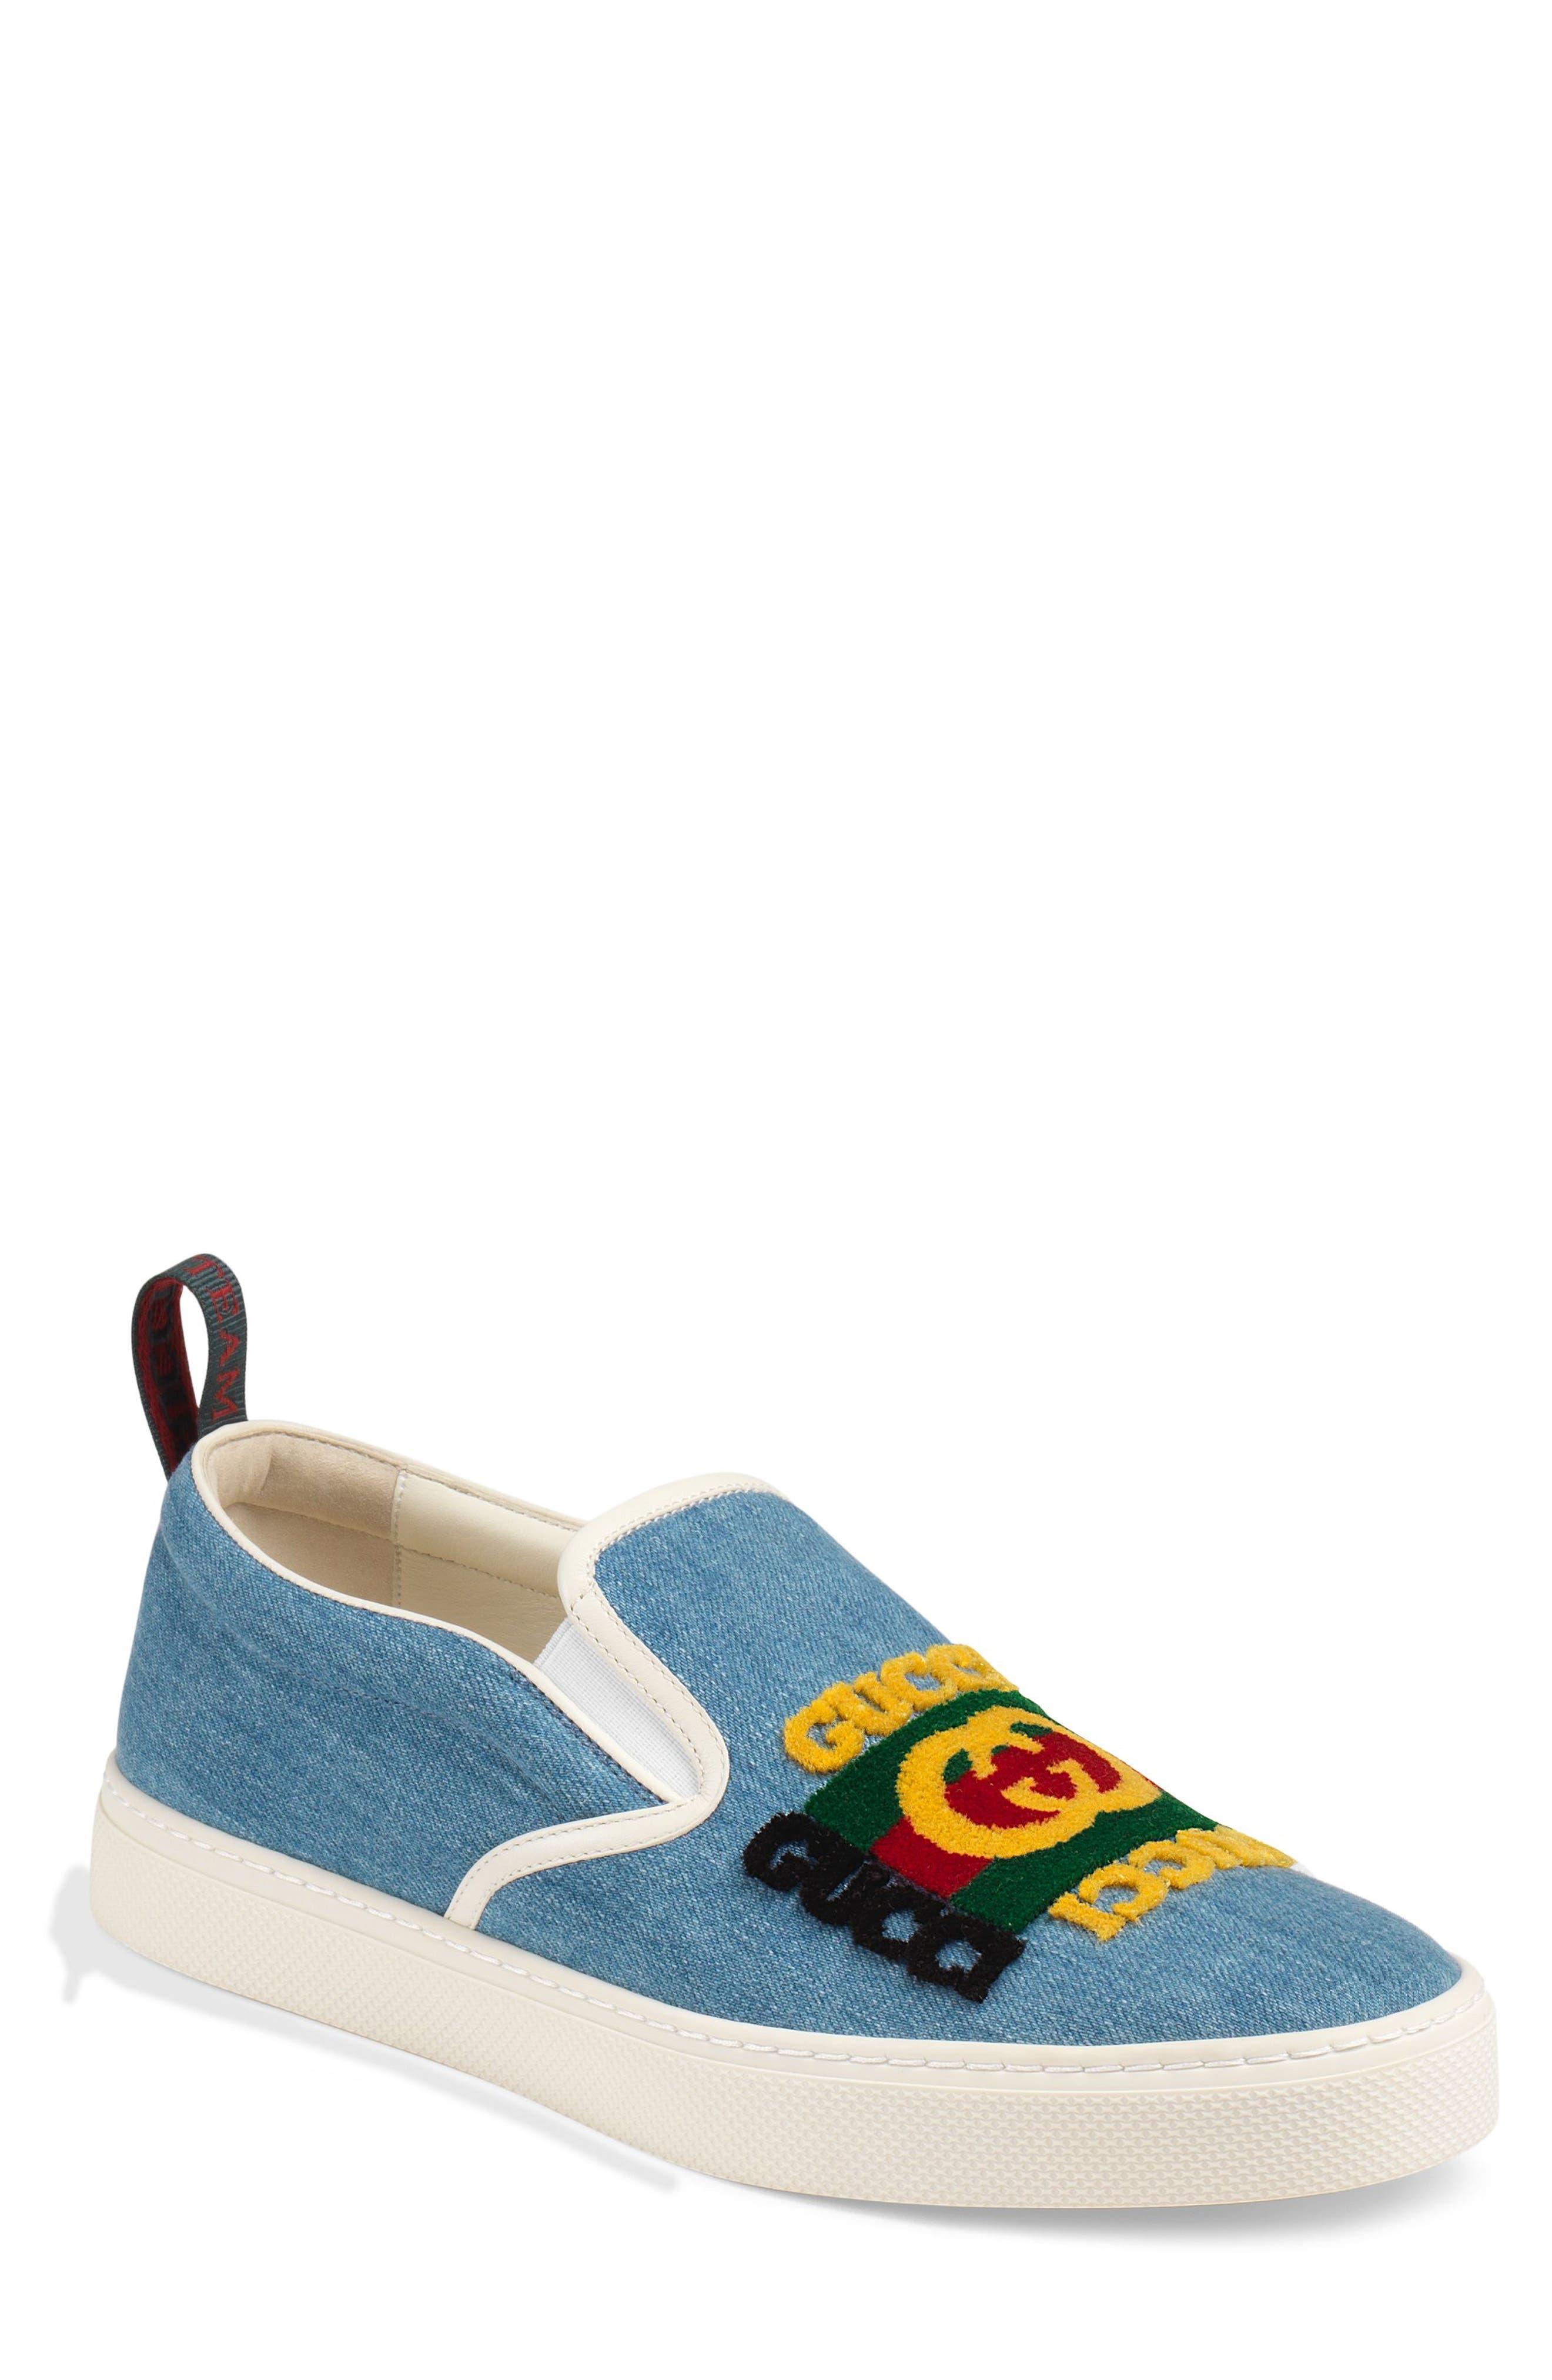 GUCCI Dublin Slip-On Sneaker, Main, color, BLUE/ BLACK